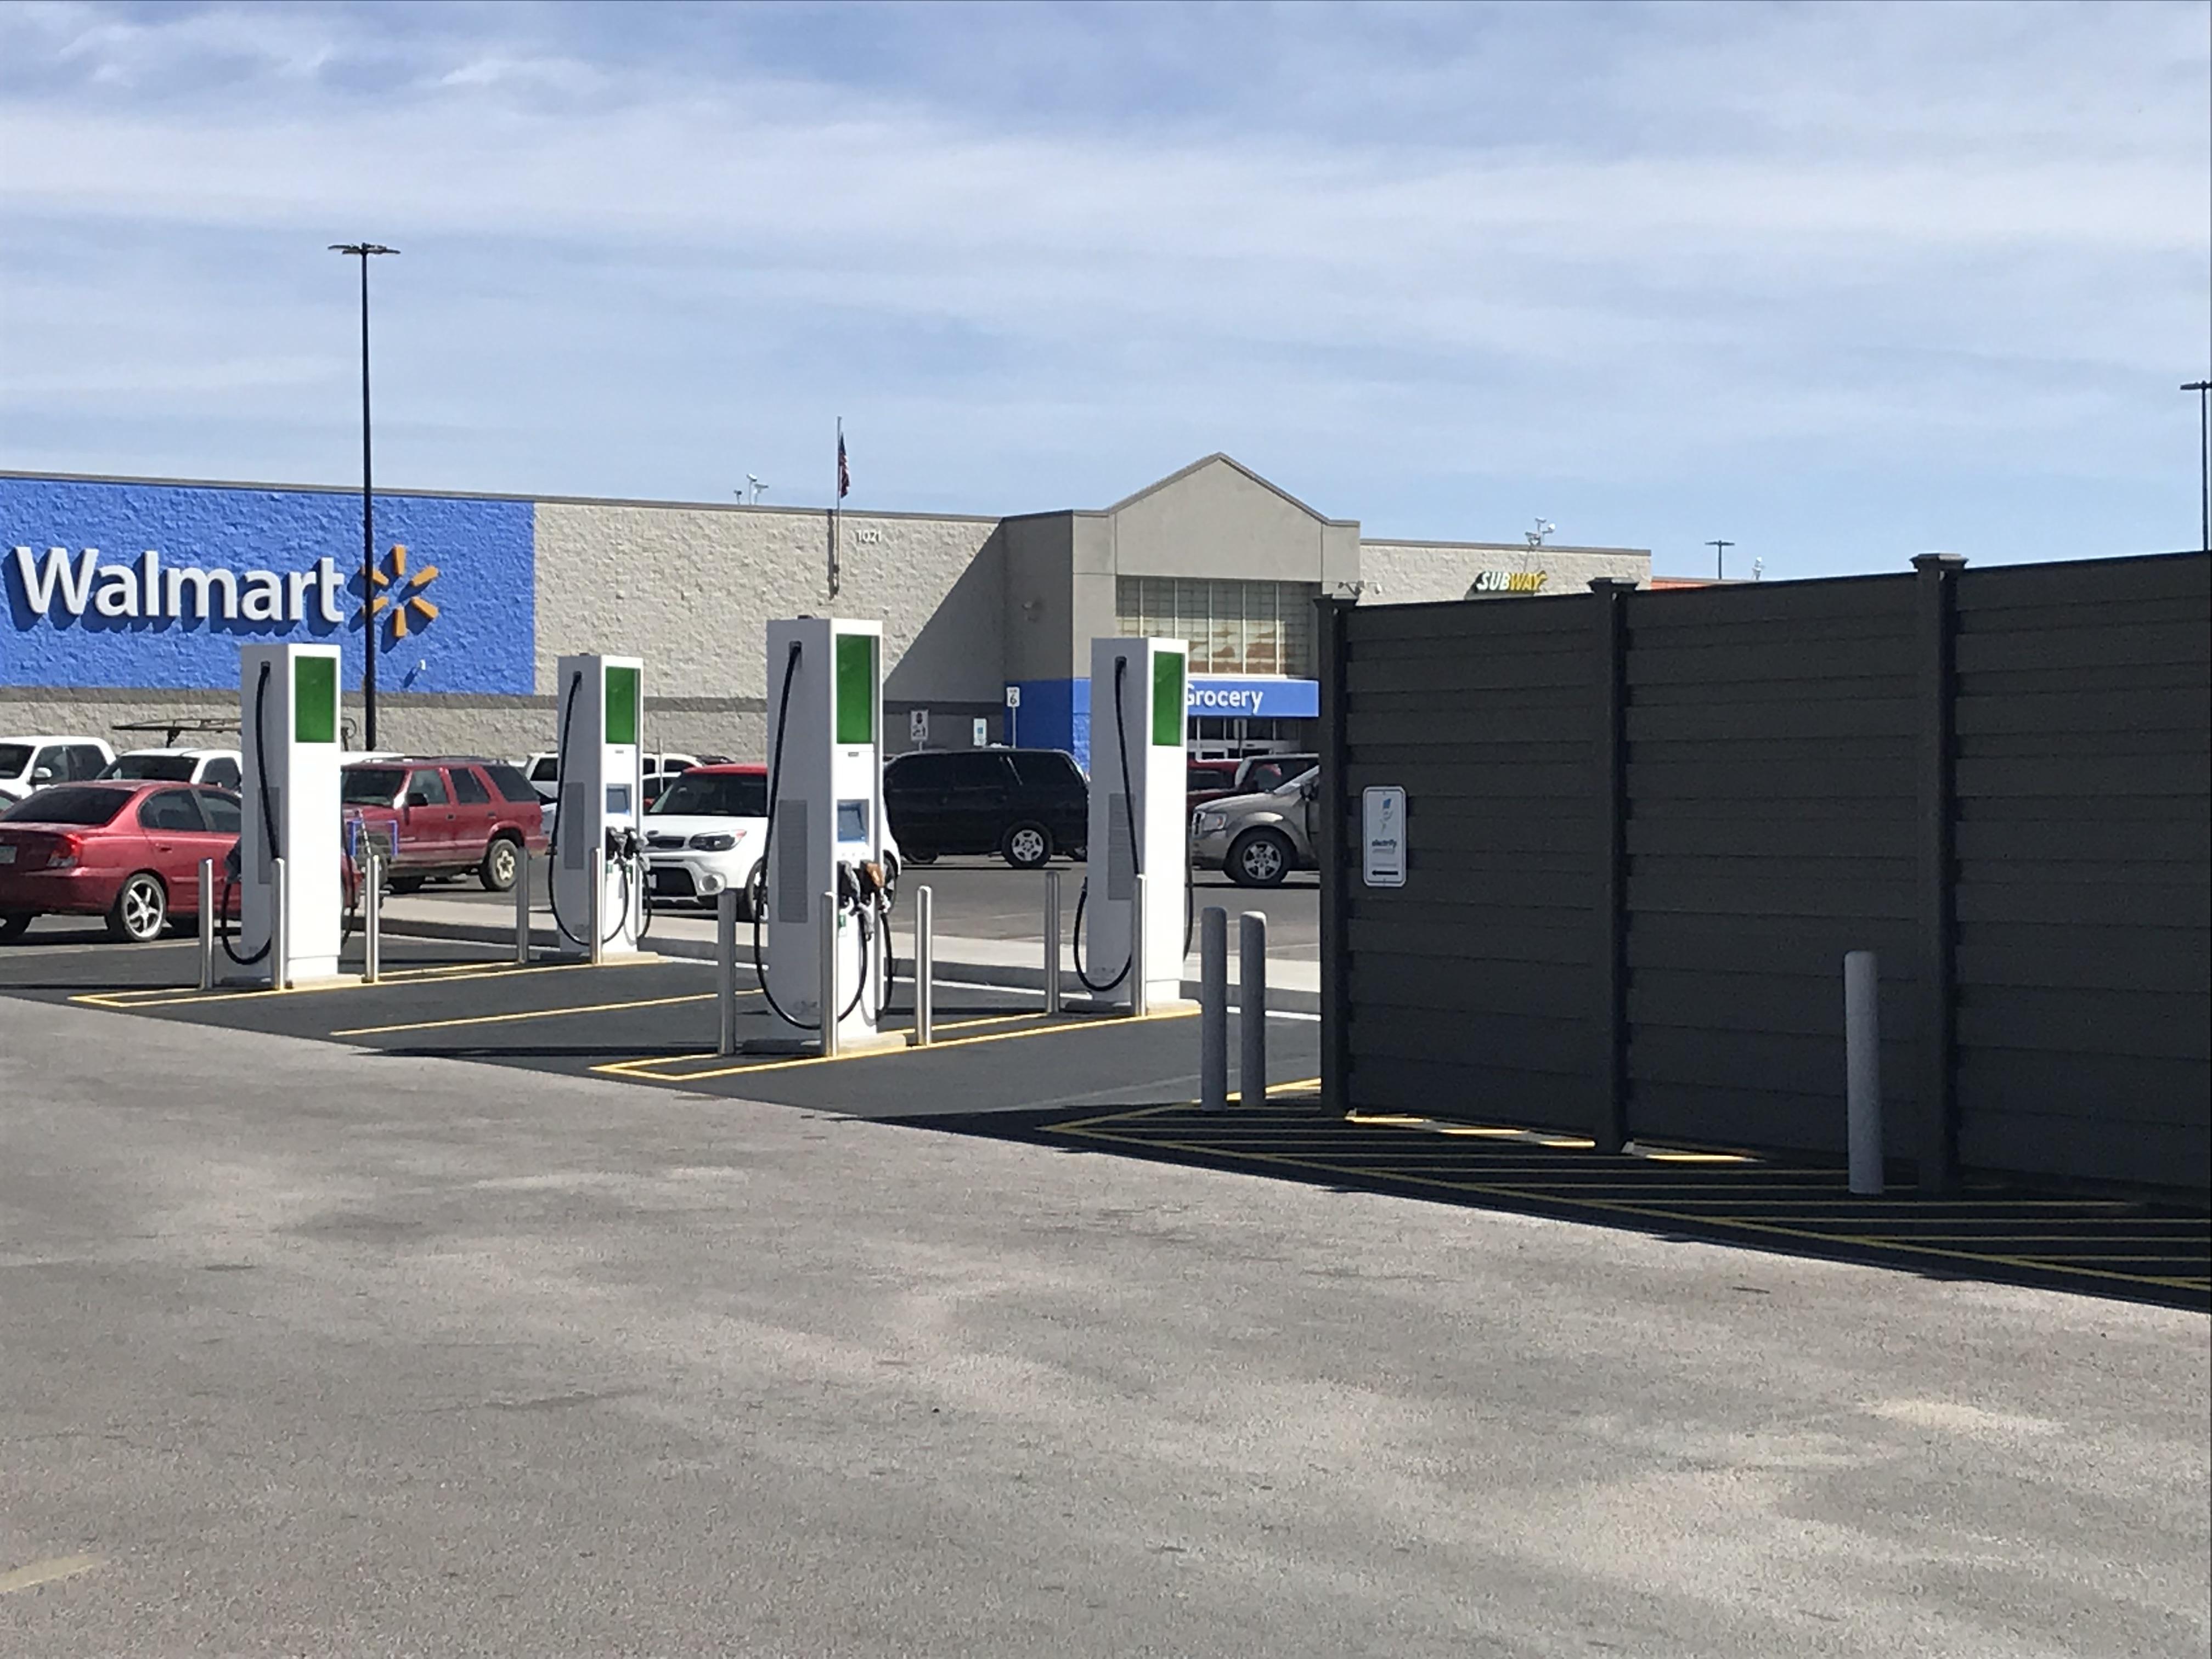 EV Charging Station at a Walmart Store